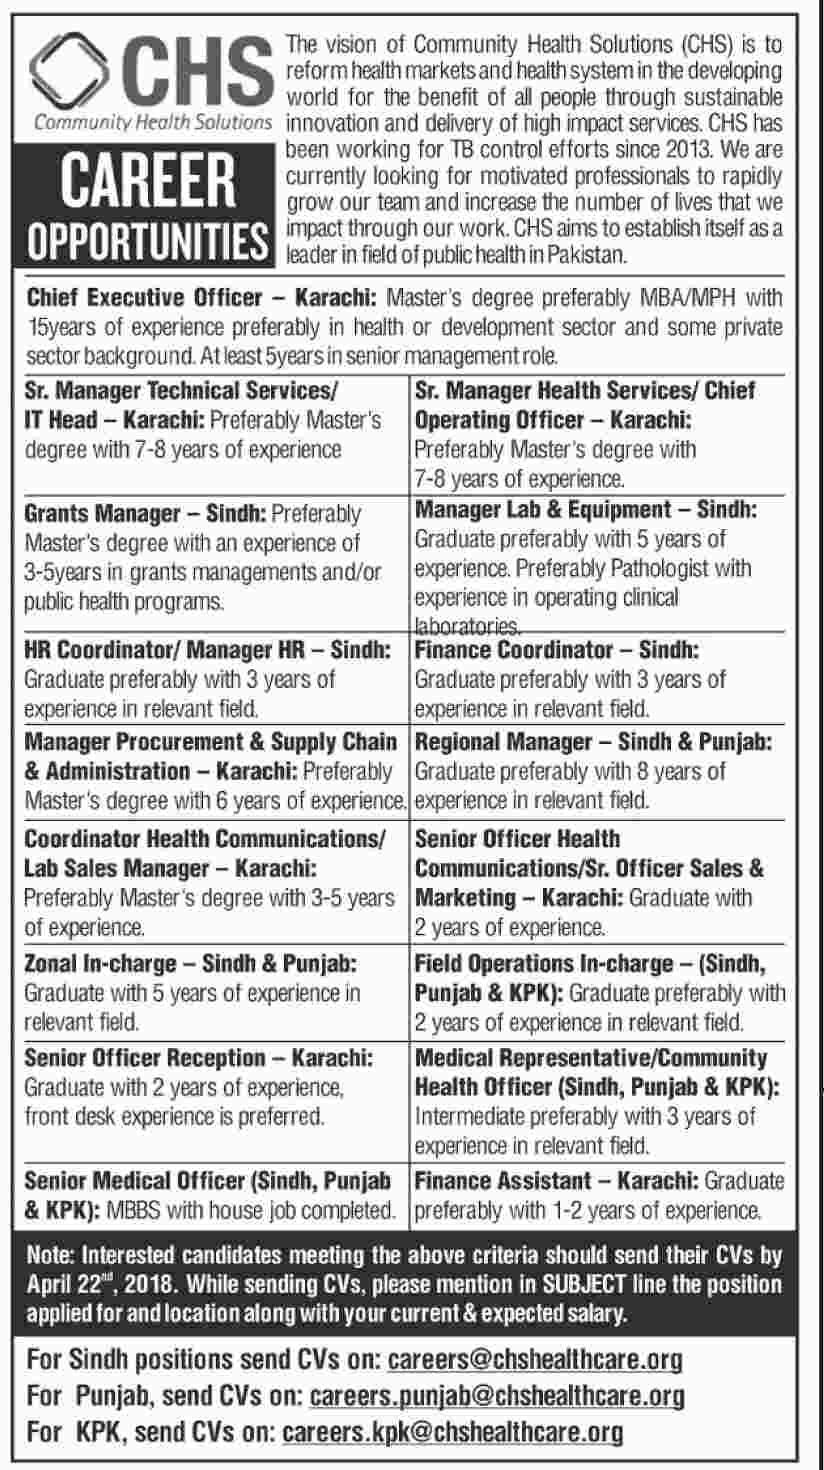 Community Health Solutions in Karachi, Sindh, Punjab,KPK